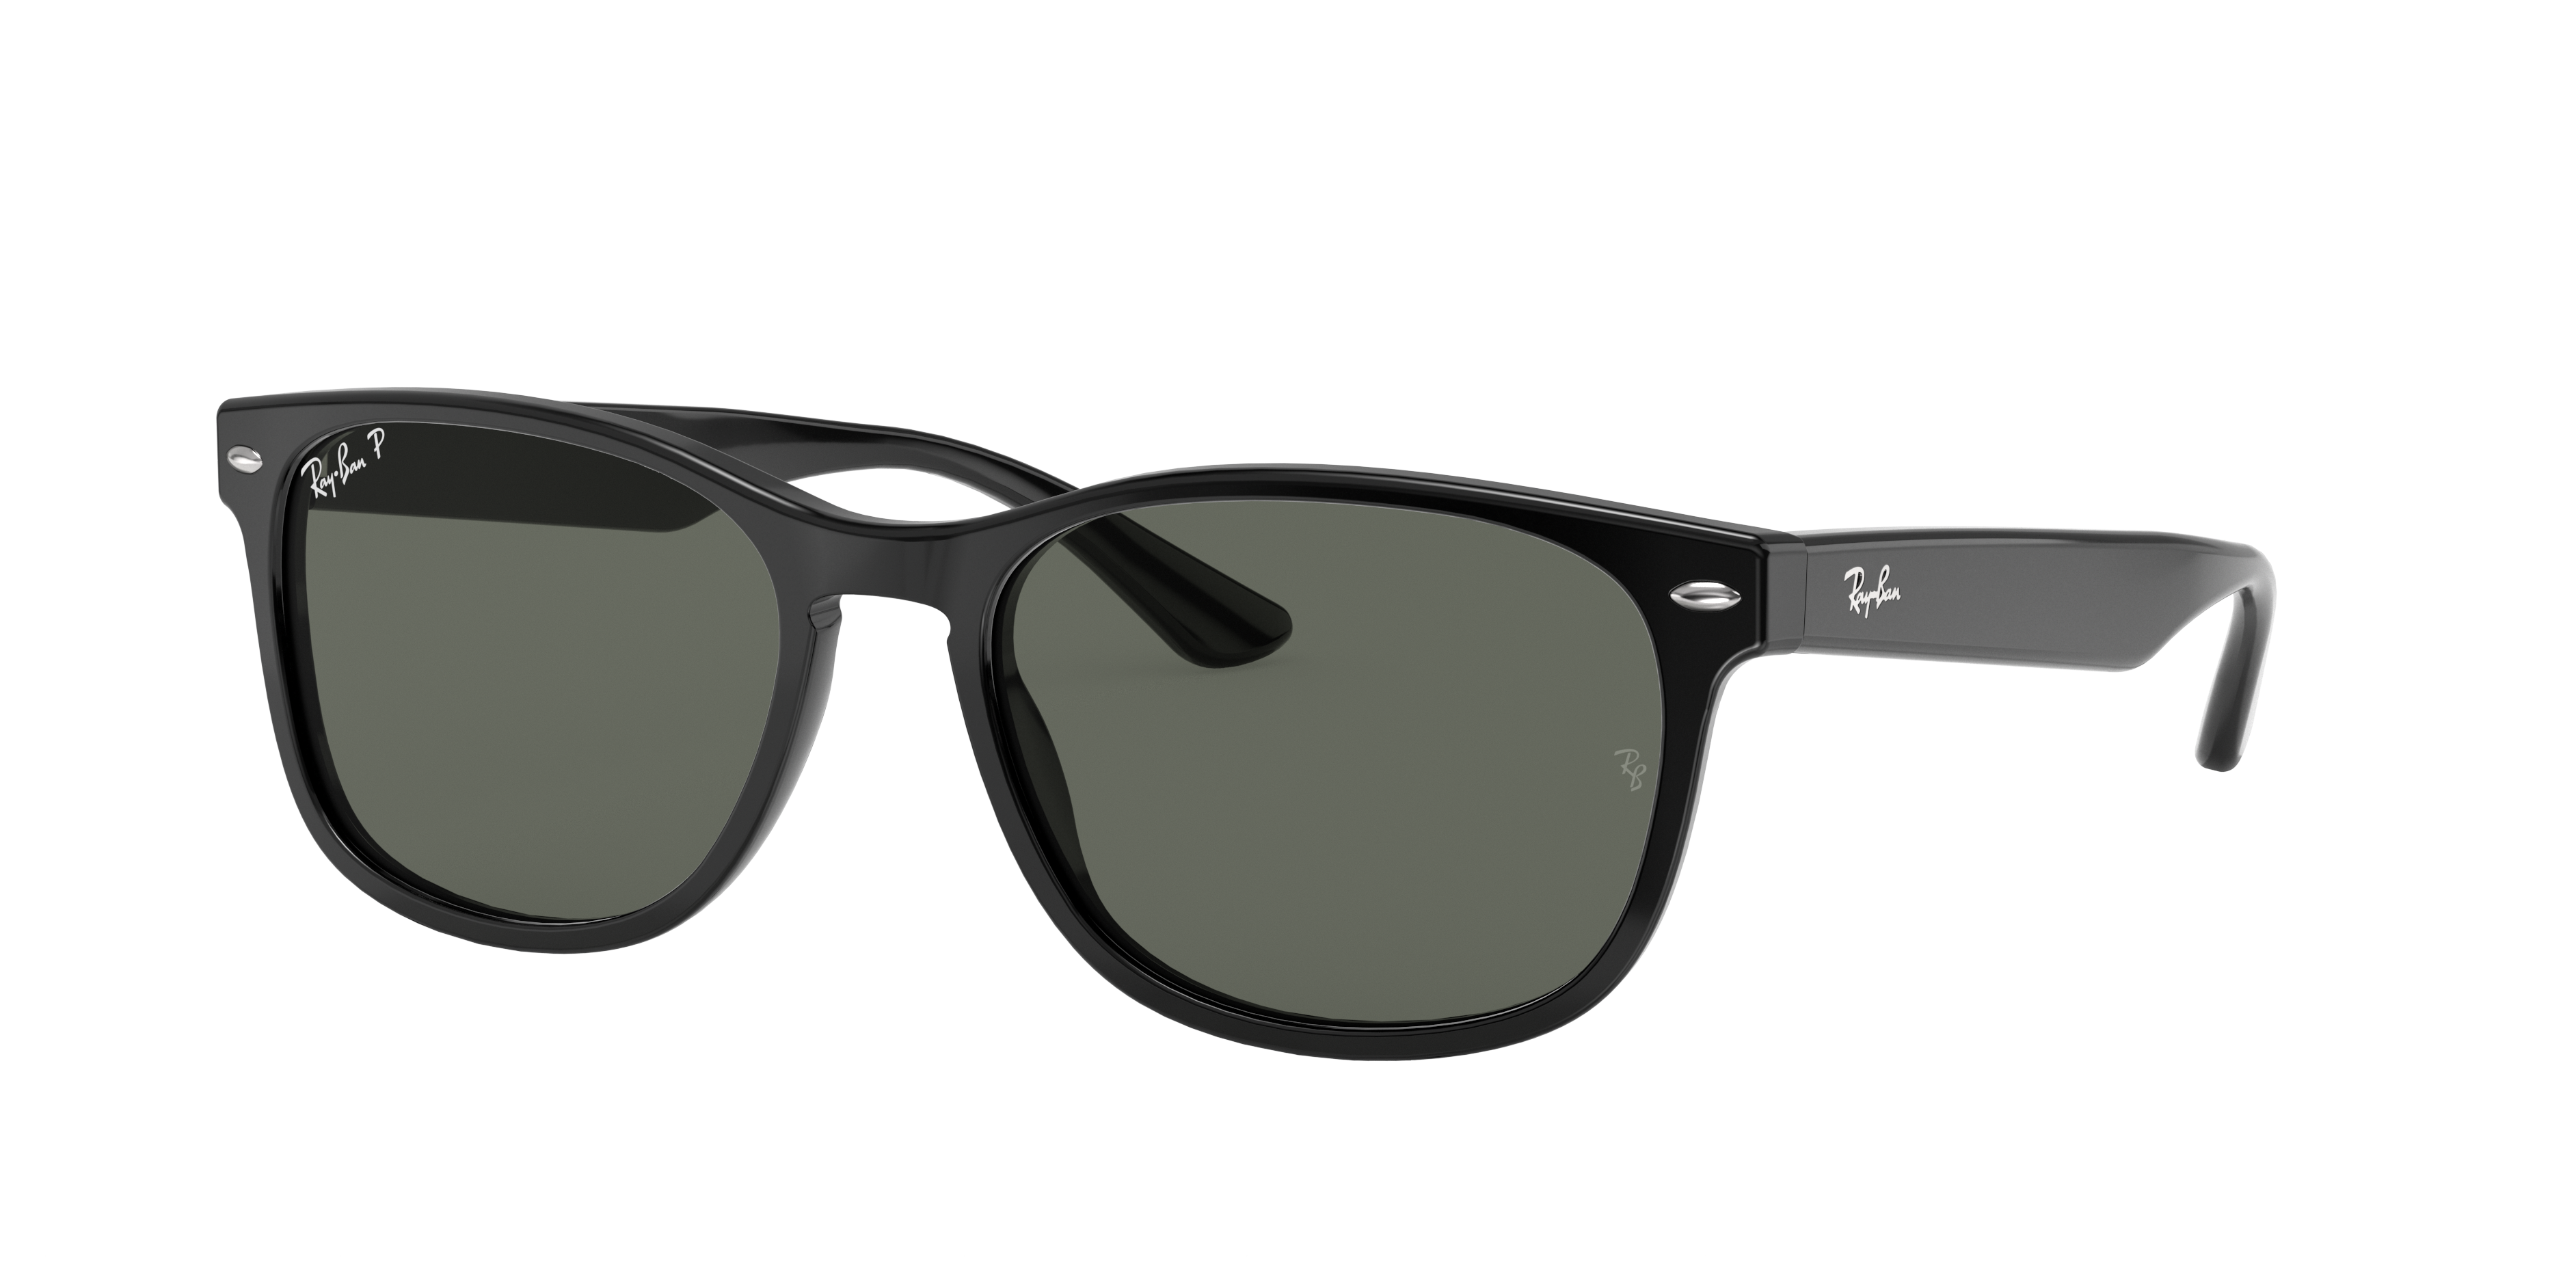 Ray-Ban Rb2184 Black, Polarized Green Lenses - RB2184